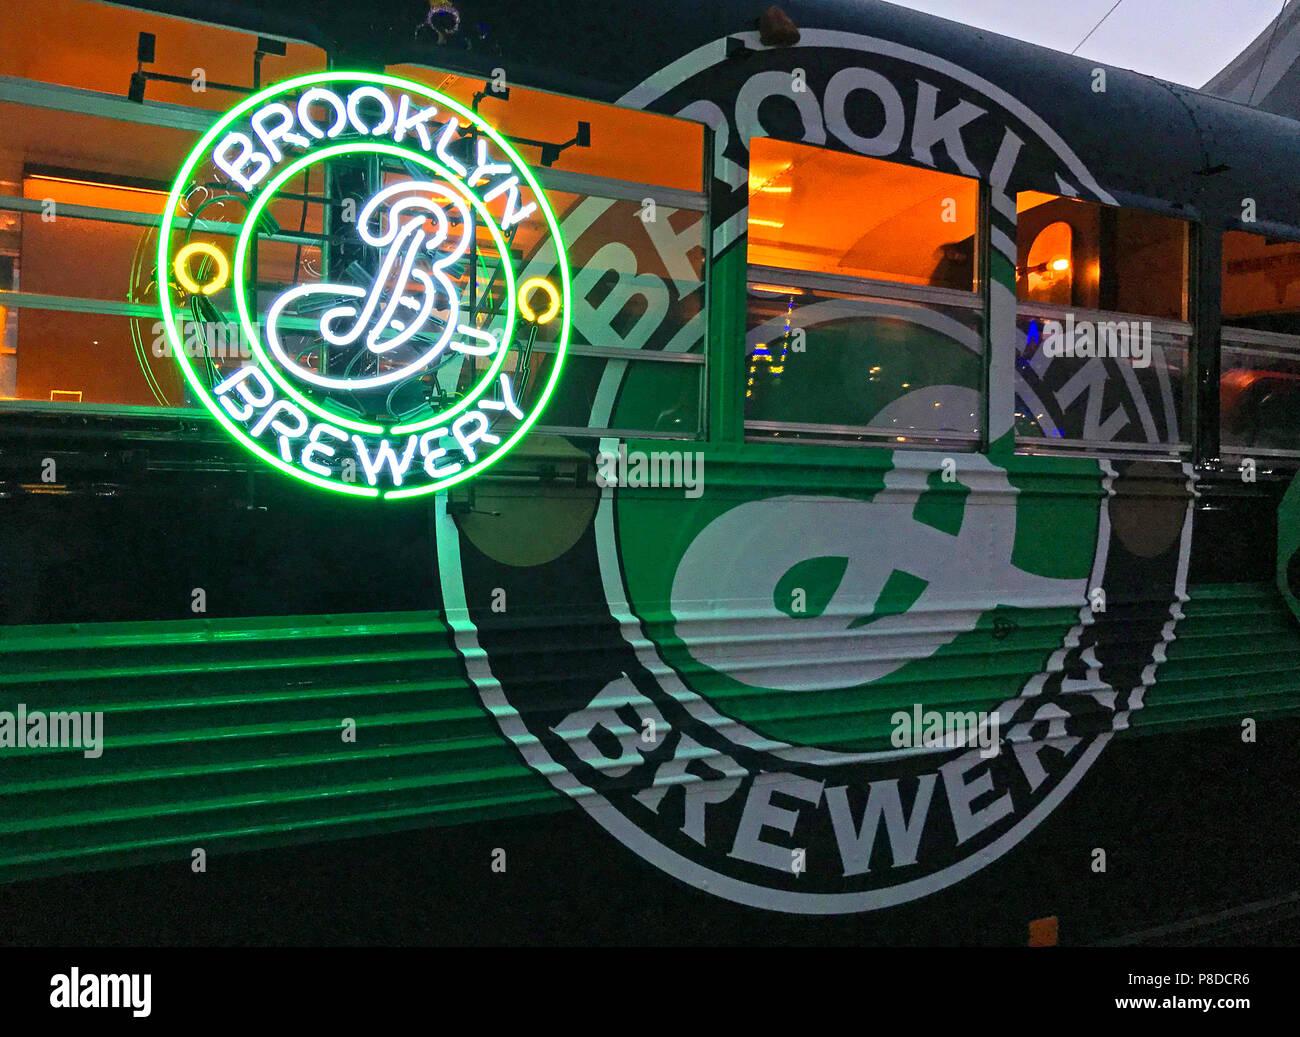 @HotpixUK,GoTonySmith,Silverstone,racing circuit,F1,GP,Formula One,Grand Prix,GrandPrix,Silverstone Woodlands,2018,Brewery,Brooklyn,Brooklyn Brewery,beer,sign,bus,craft beer,Microbrewery,79 N 11th St,New York,NY,11249,USA,Brooklyn neon sign,Brooklyn Brewery sign,Brooklyn Brewery Beer,green,yellow,dusk,night,Bel Air Sour,Defender IPA,IPA,American IPA,Craft IPA,Naranjito Orange peel pale ale,pale ale